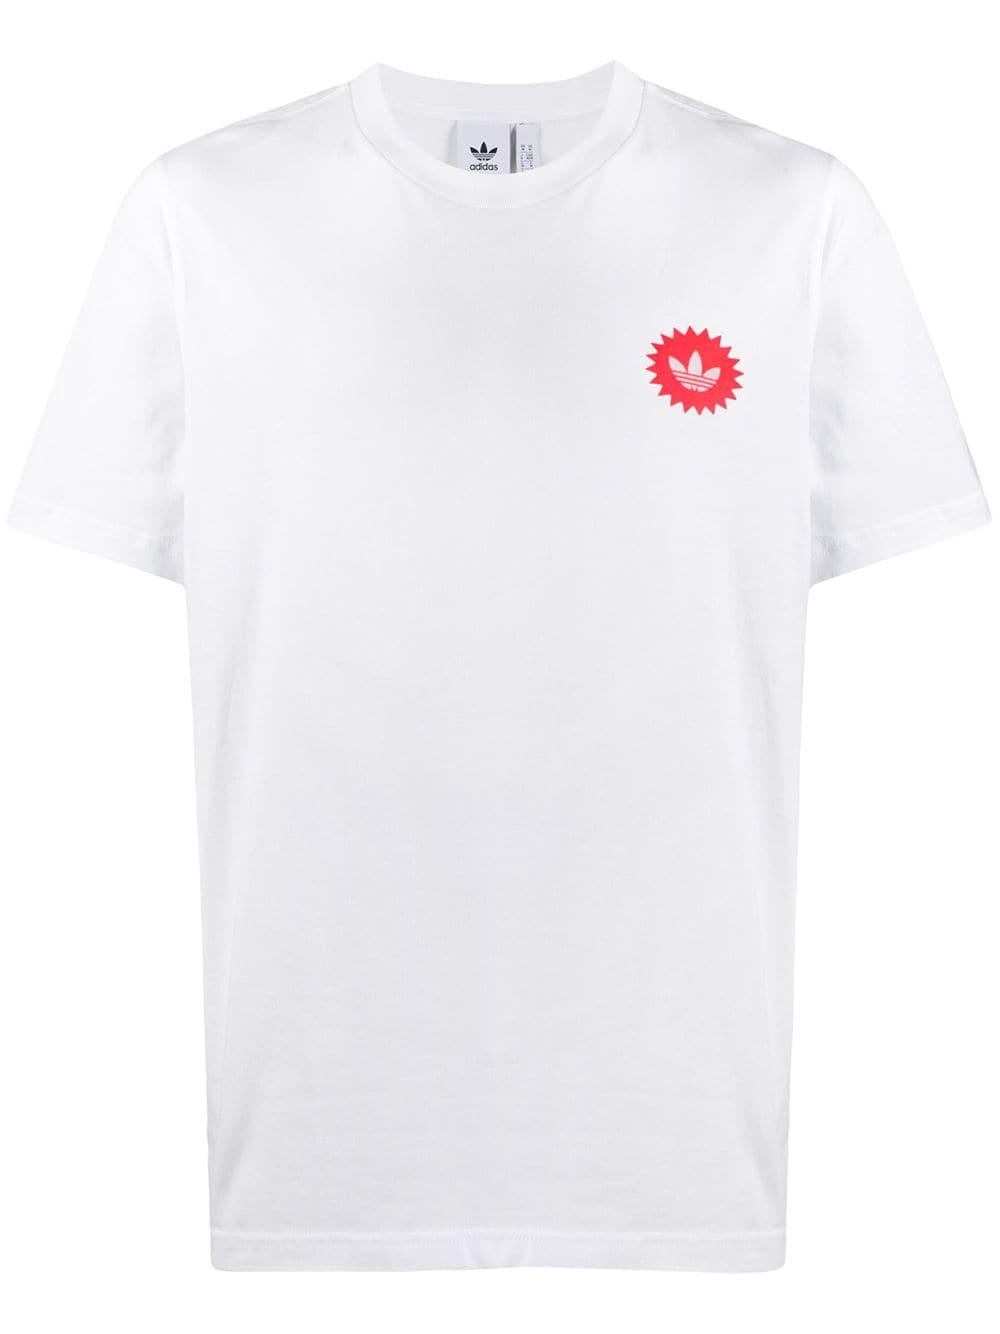 Adidas Originals Power Drink T In White Modesens White Adidas Shirts Adidas